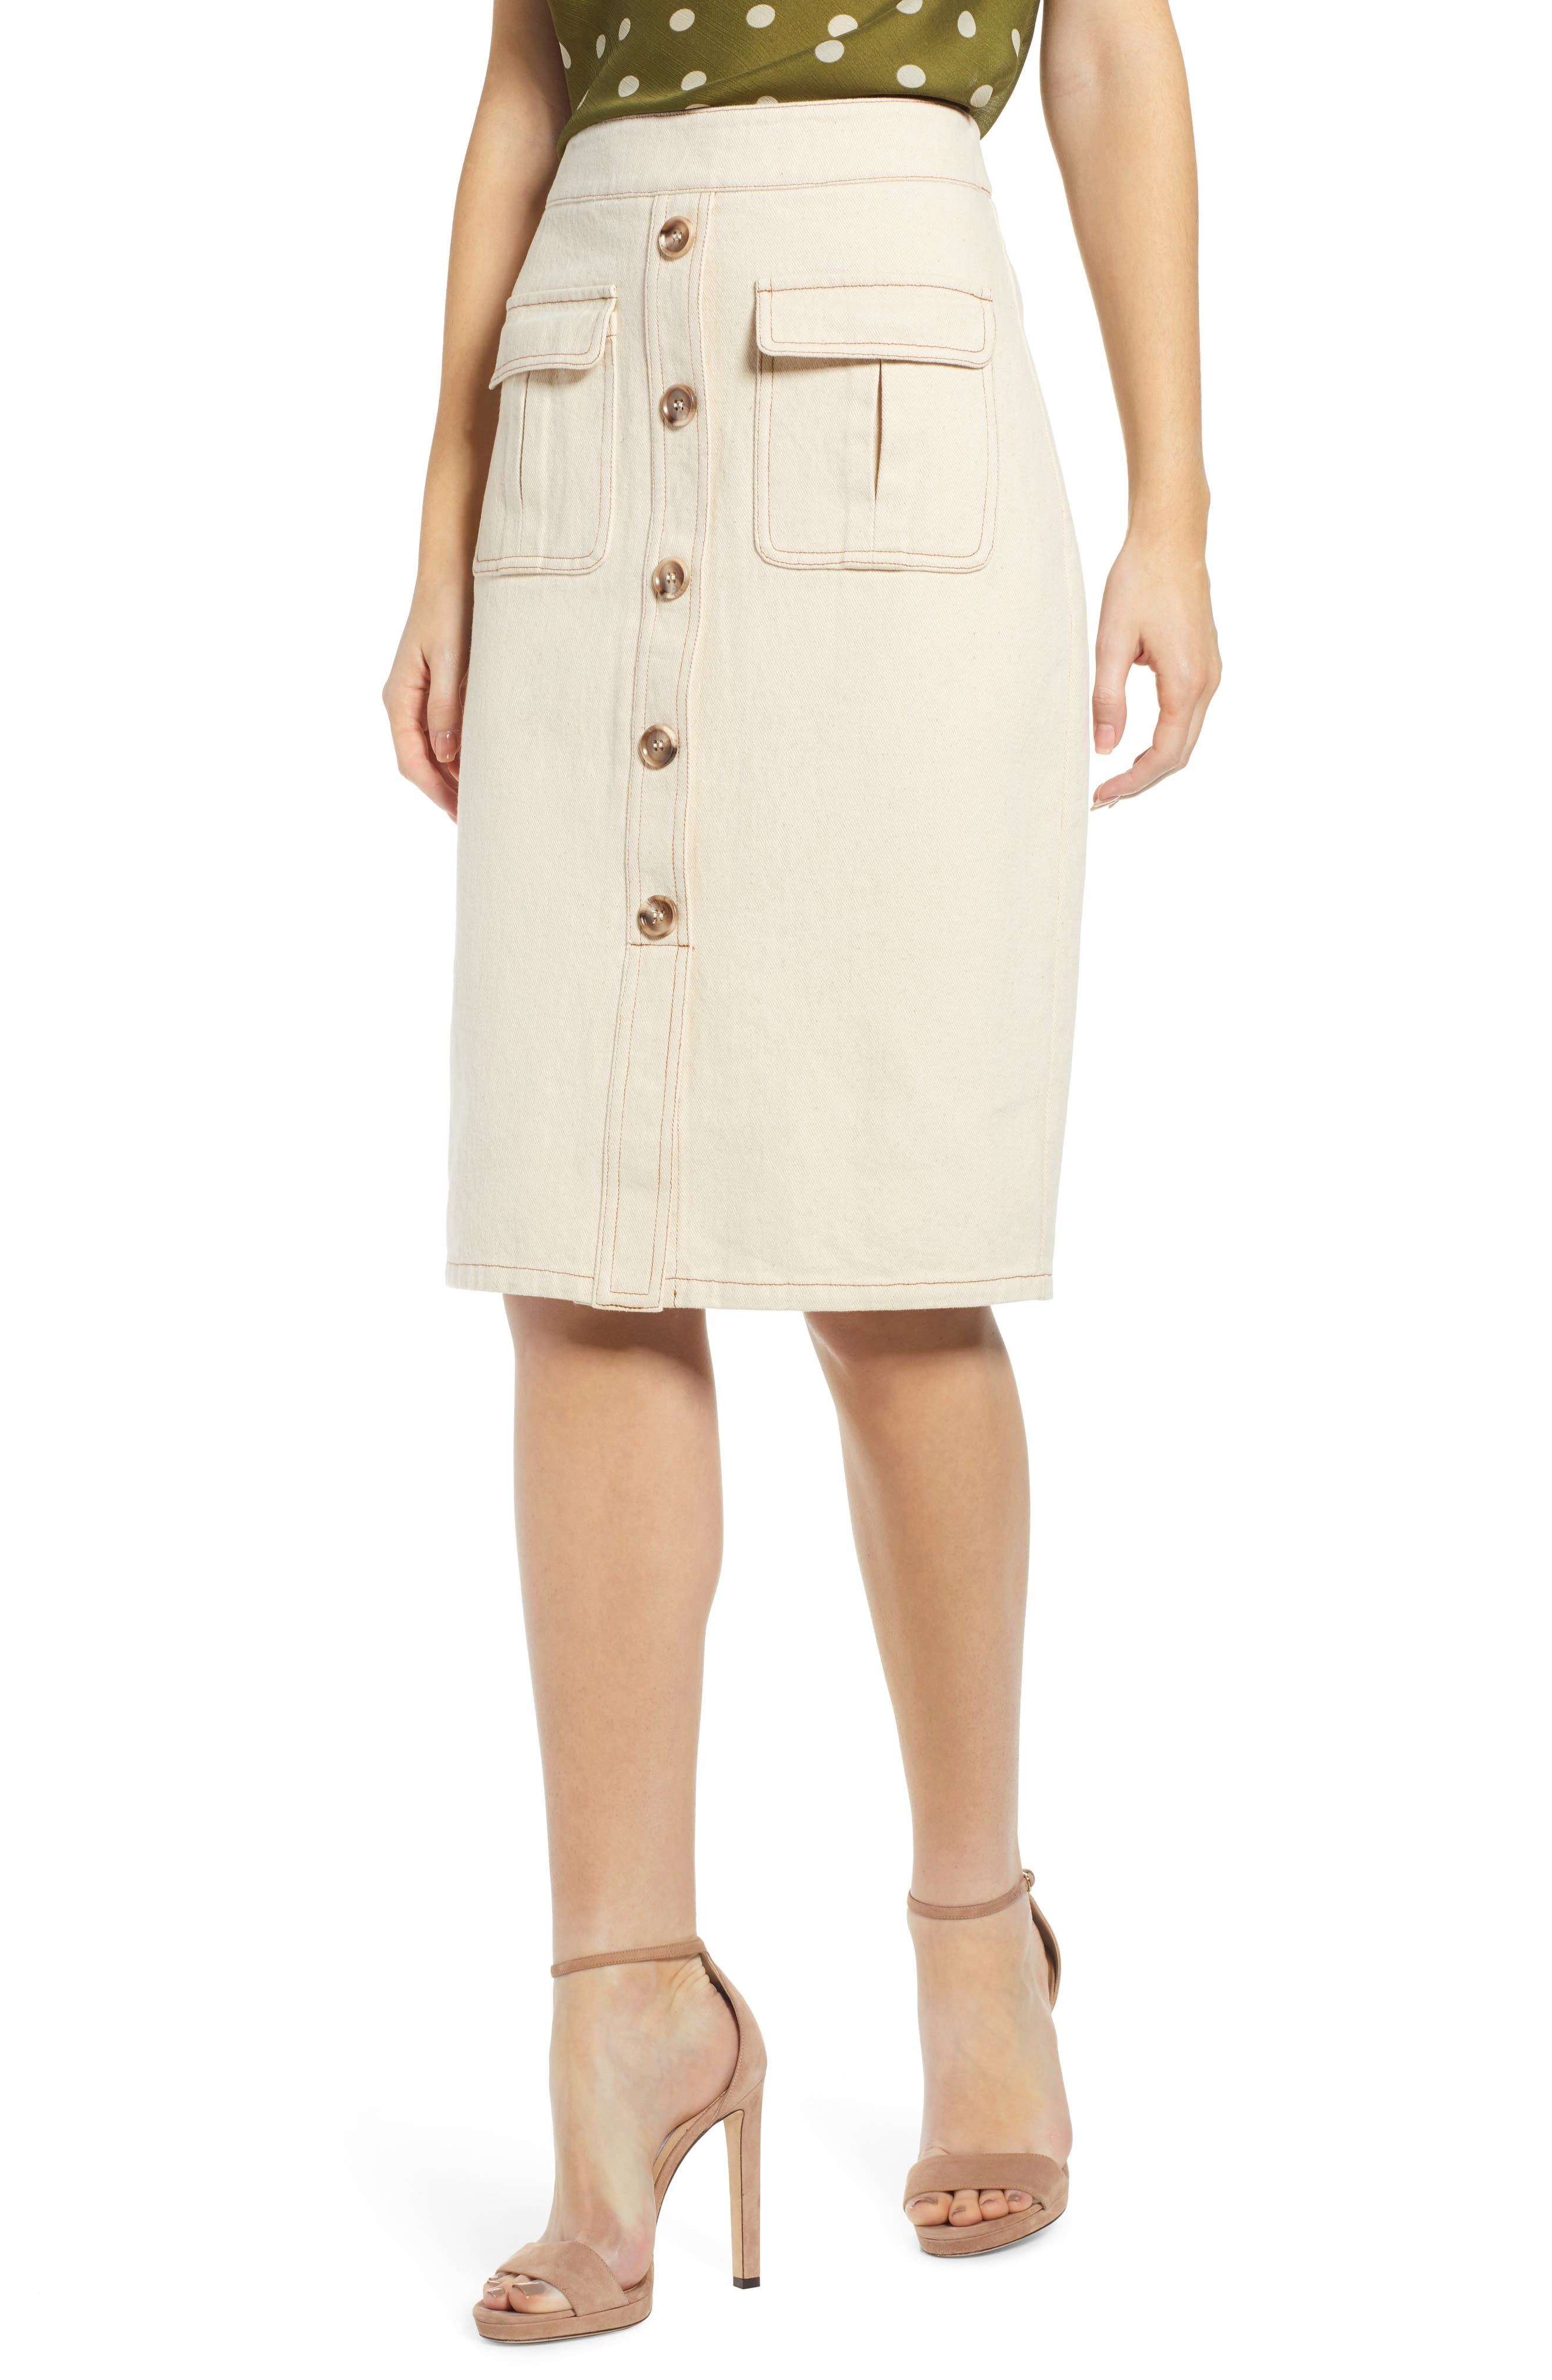 CHRISELLE LIM COLLECTION Chriselle Lim Marine Midi Skirt, Main, color, BONE